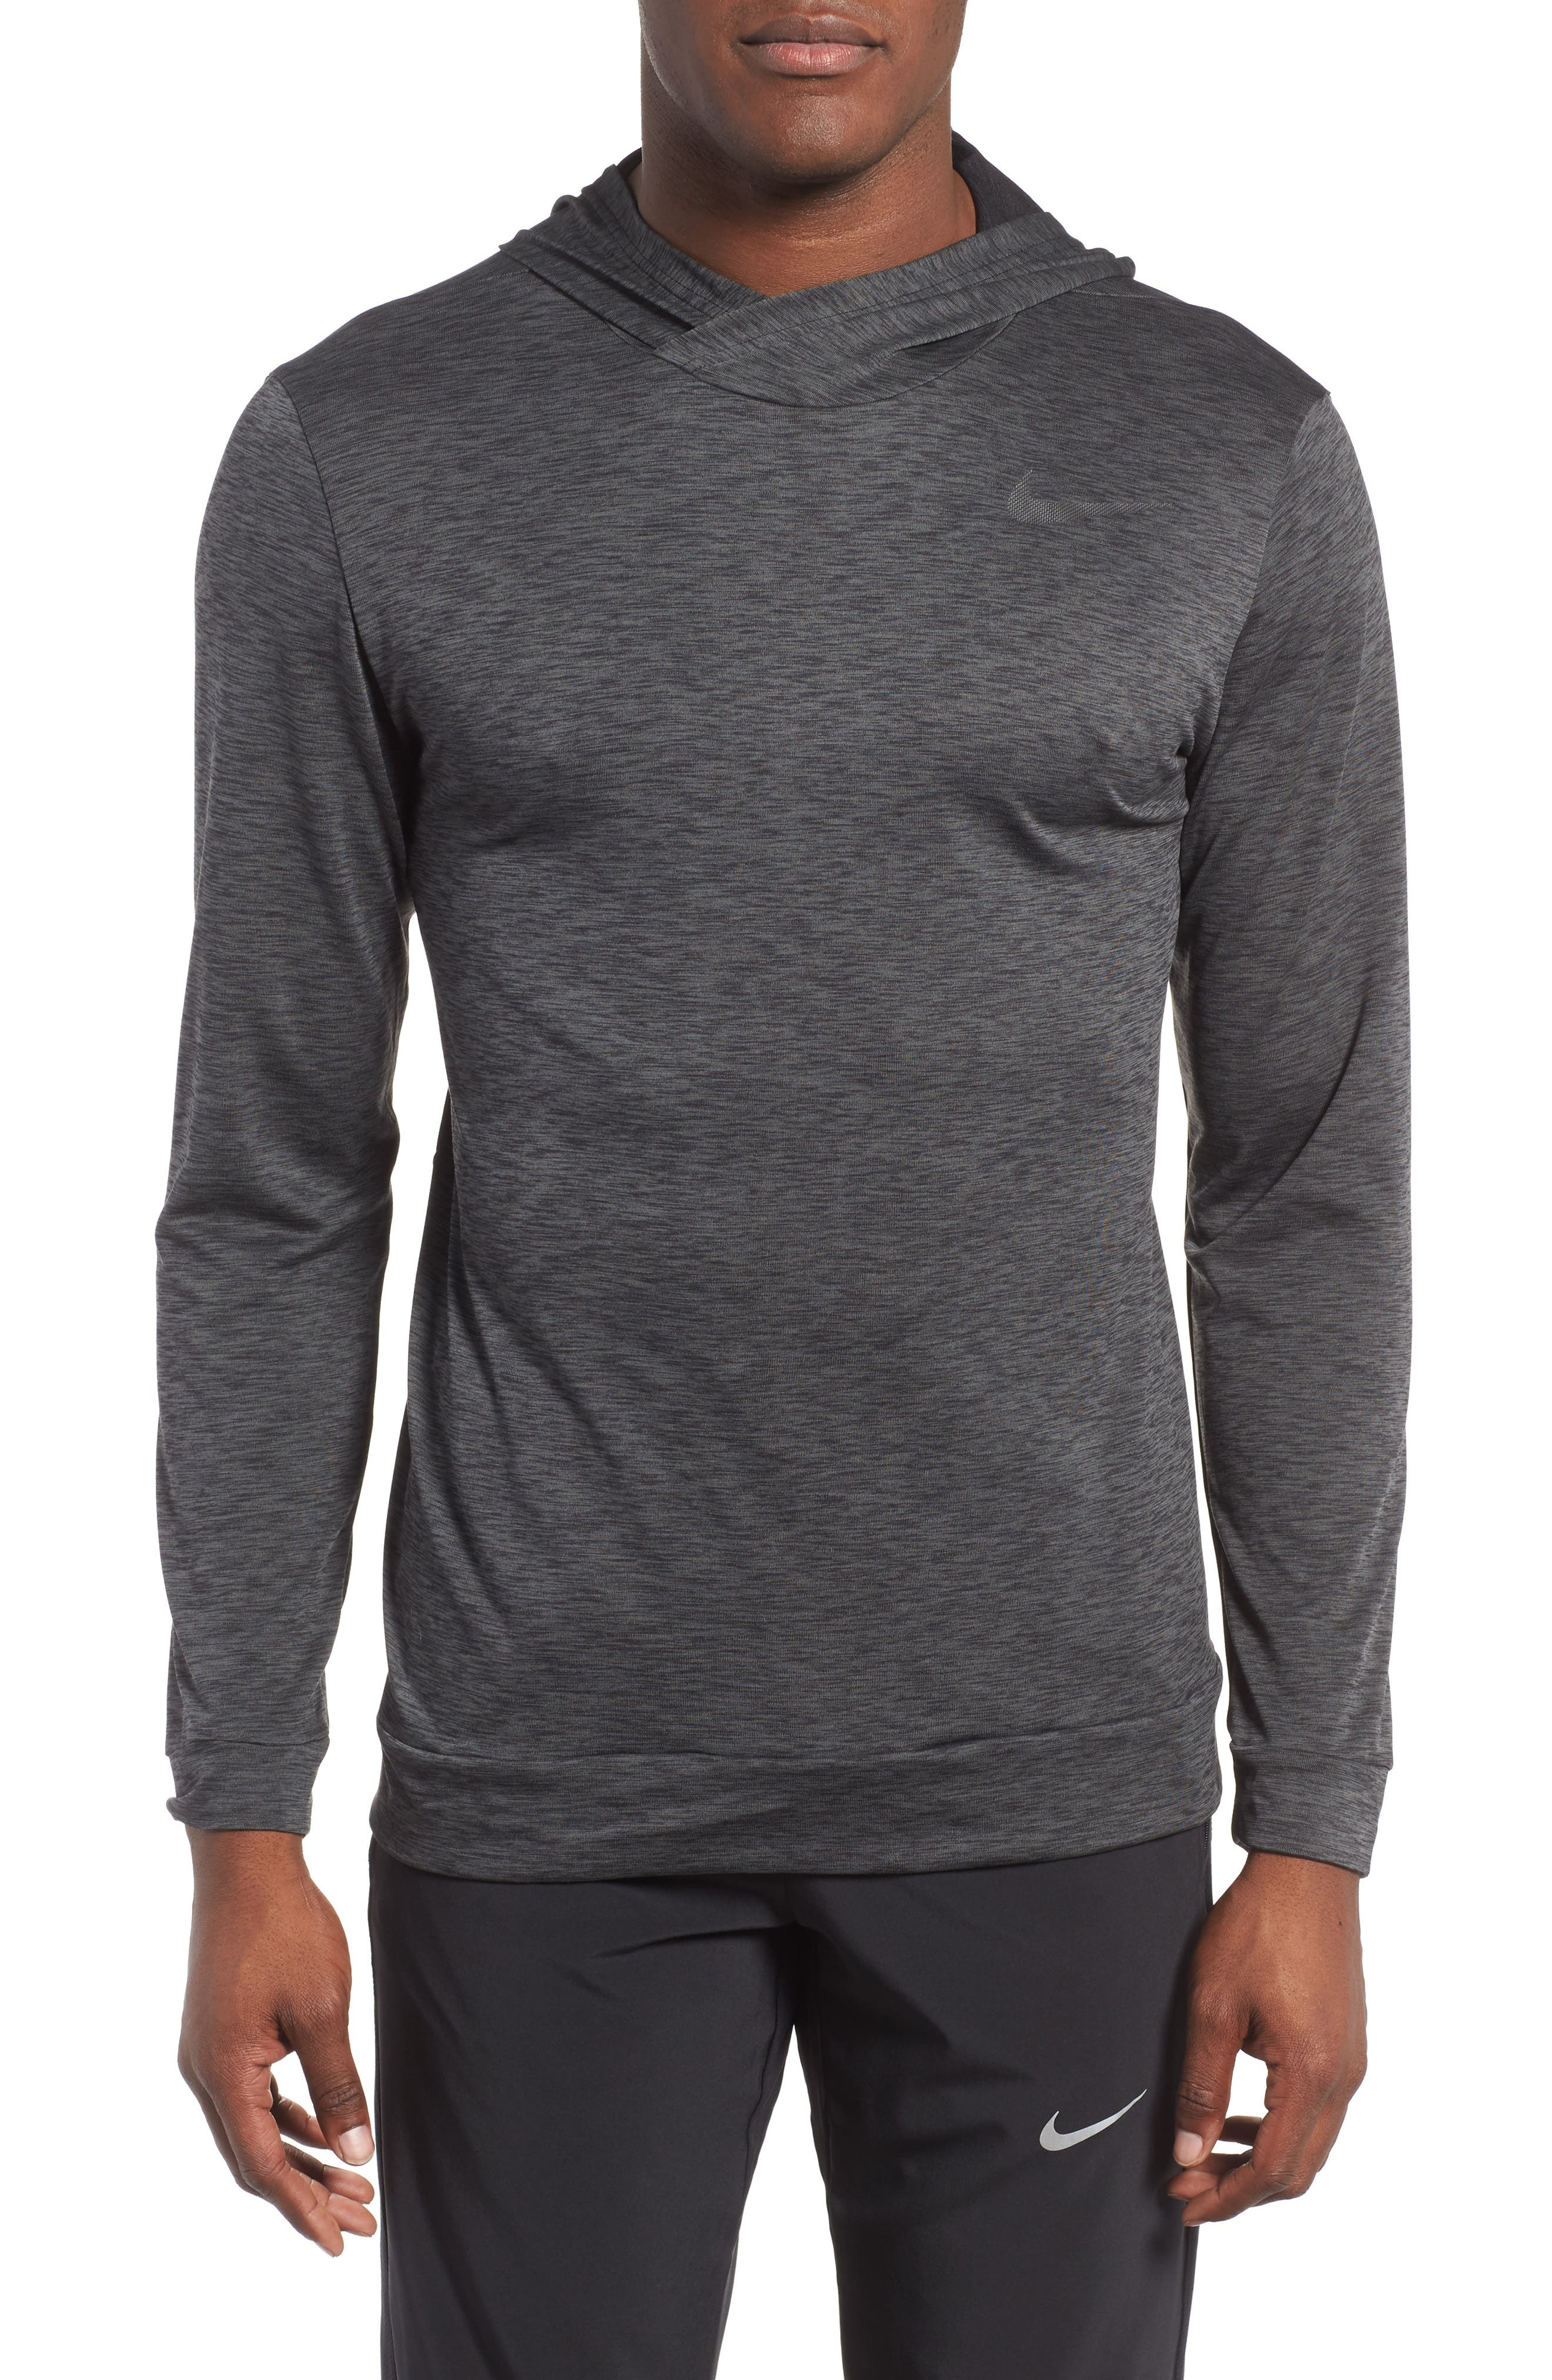 Hyper Dry Regular Fit Training Hoodie,                         Main,                         color, ANTHRACITE/BLACK/BLACK